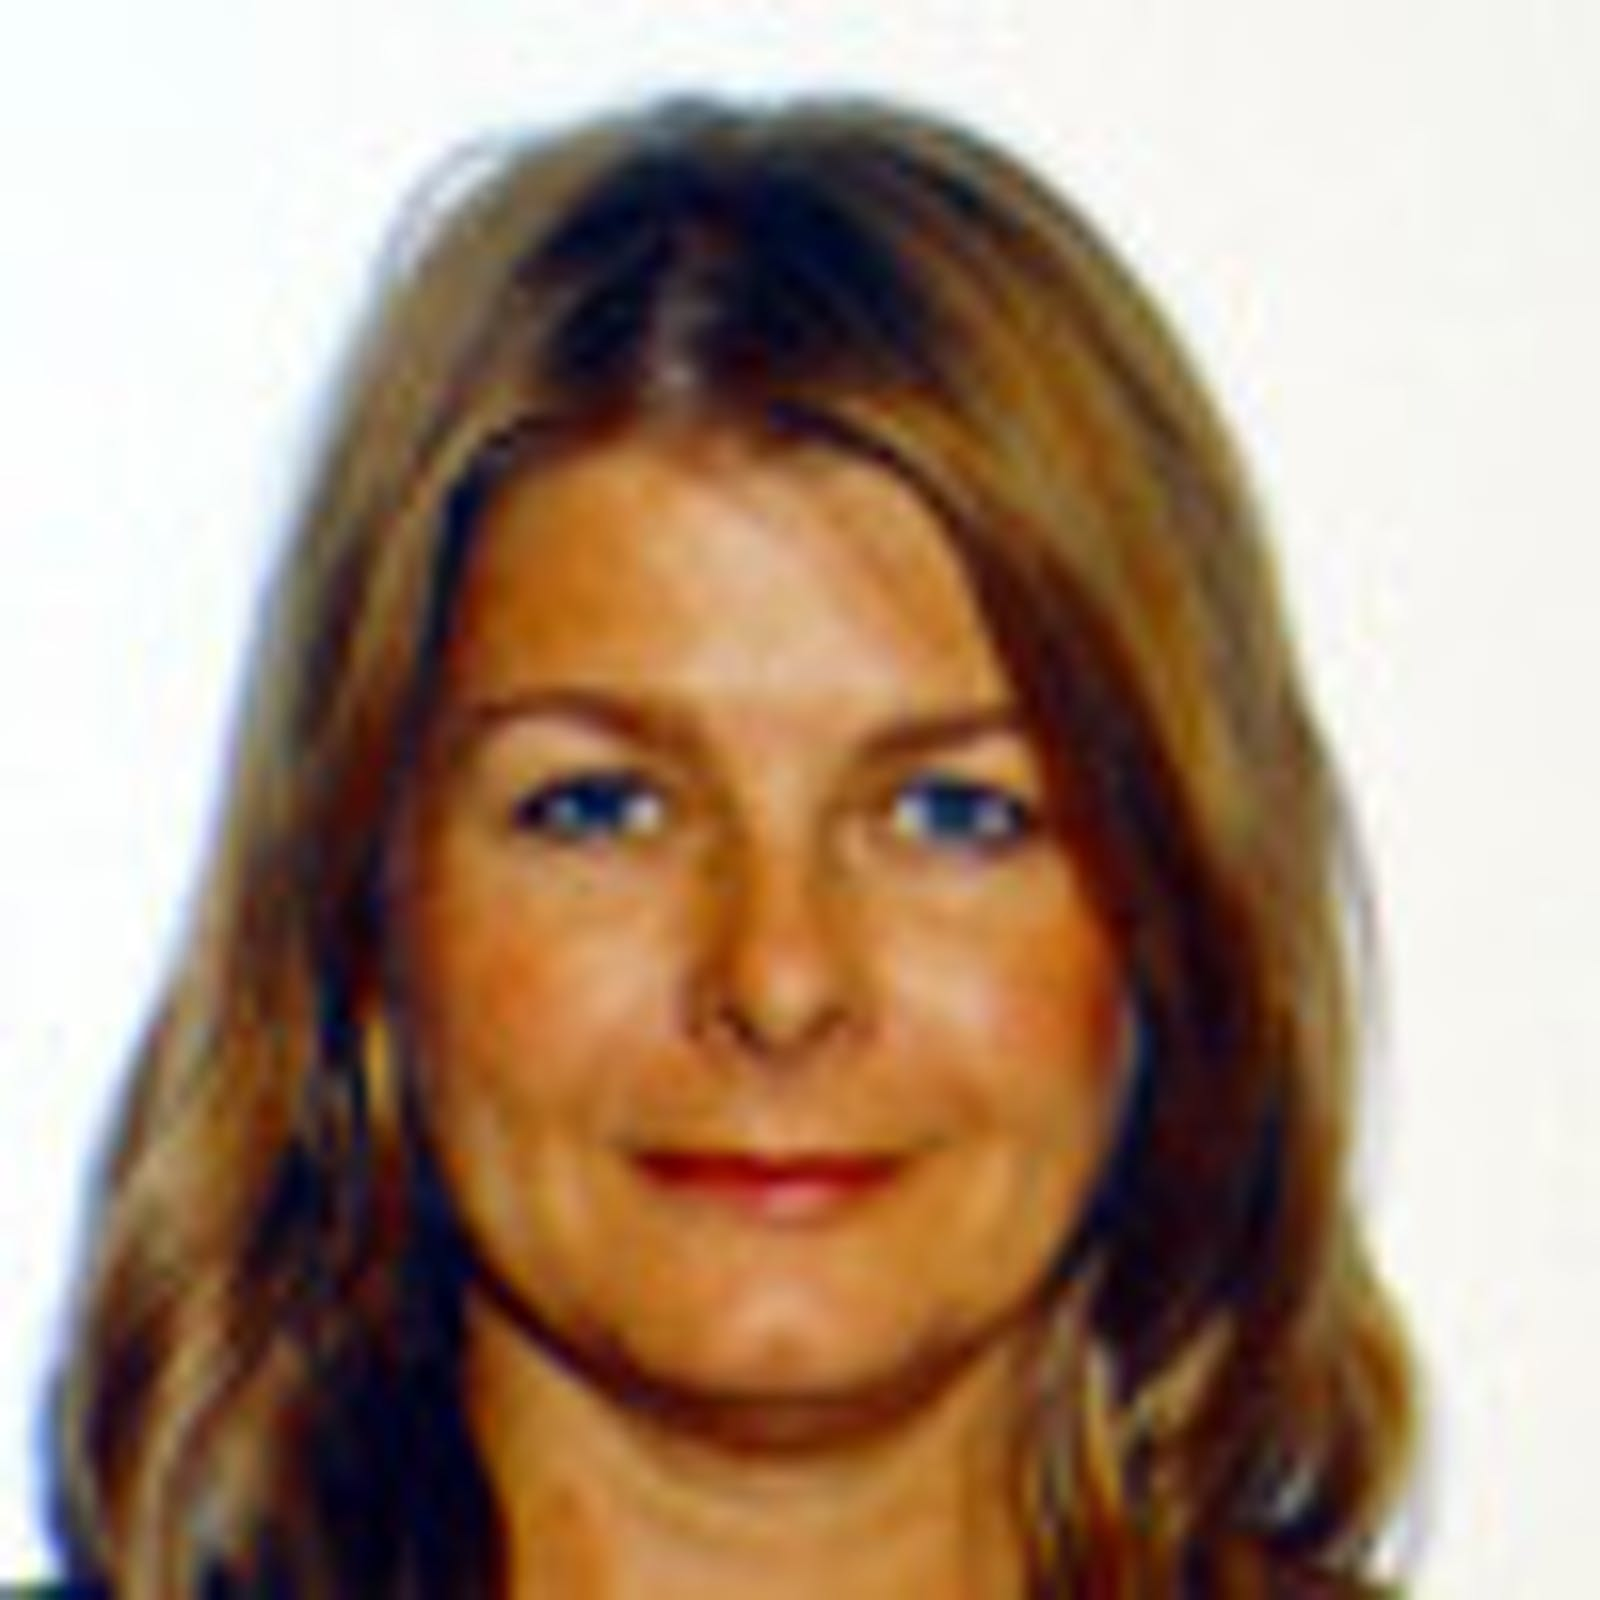 Tracey Scoffield